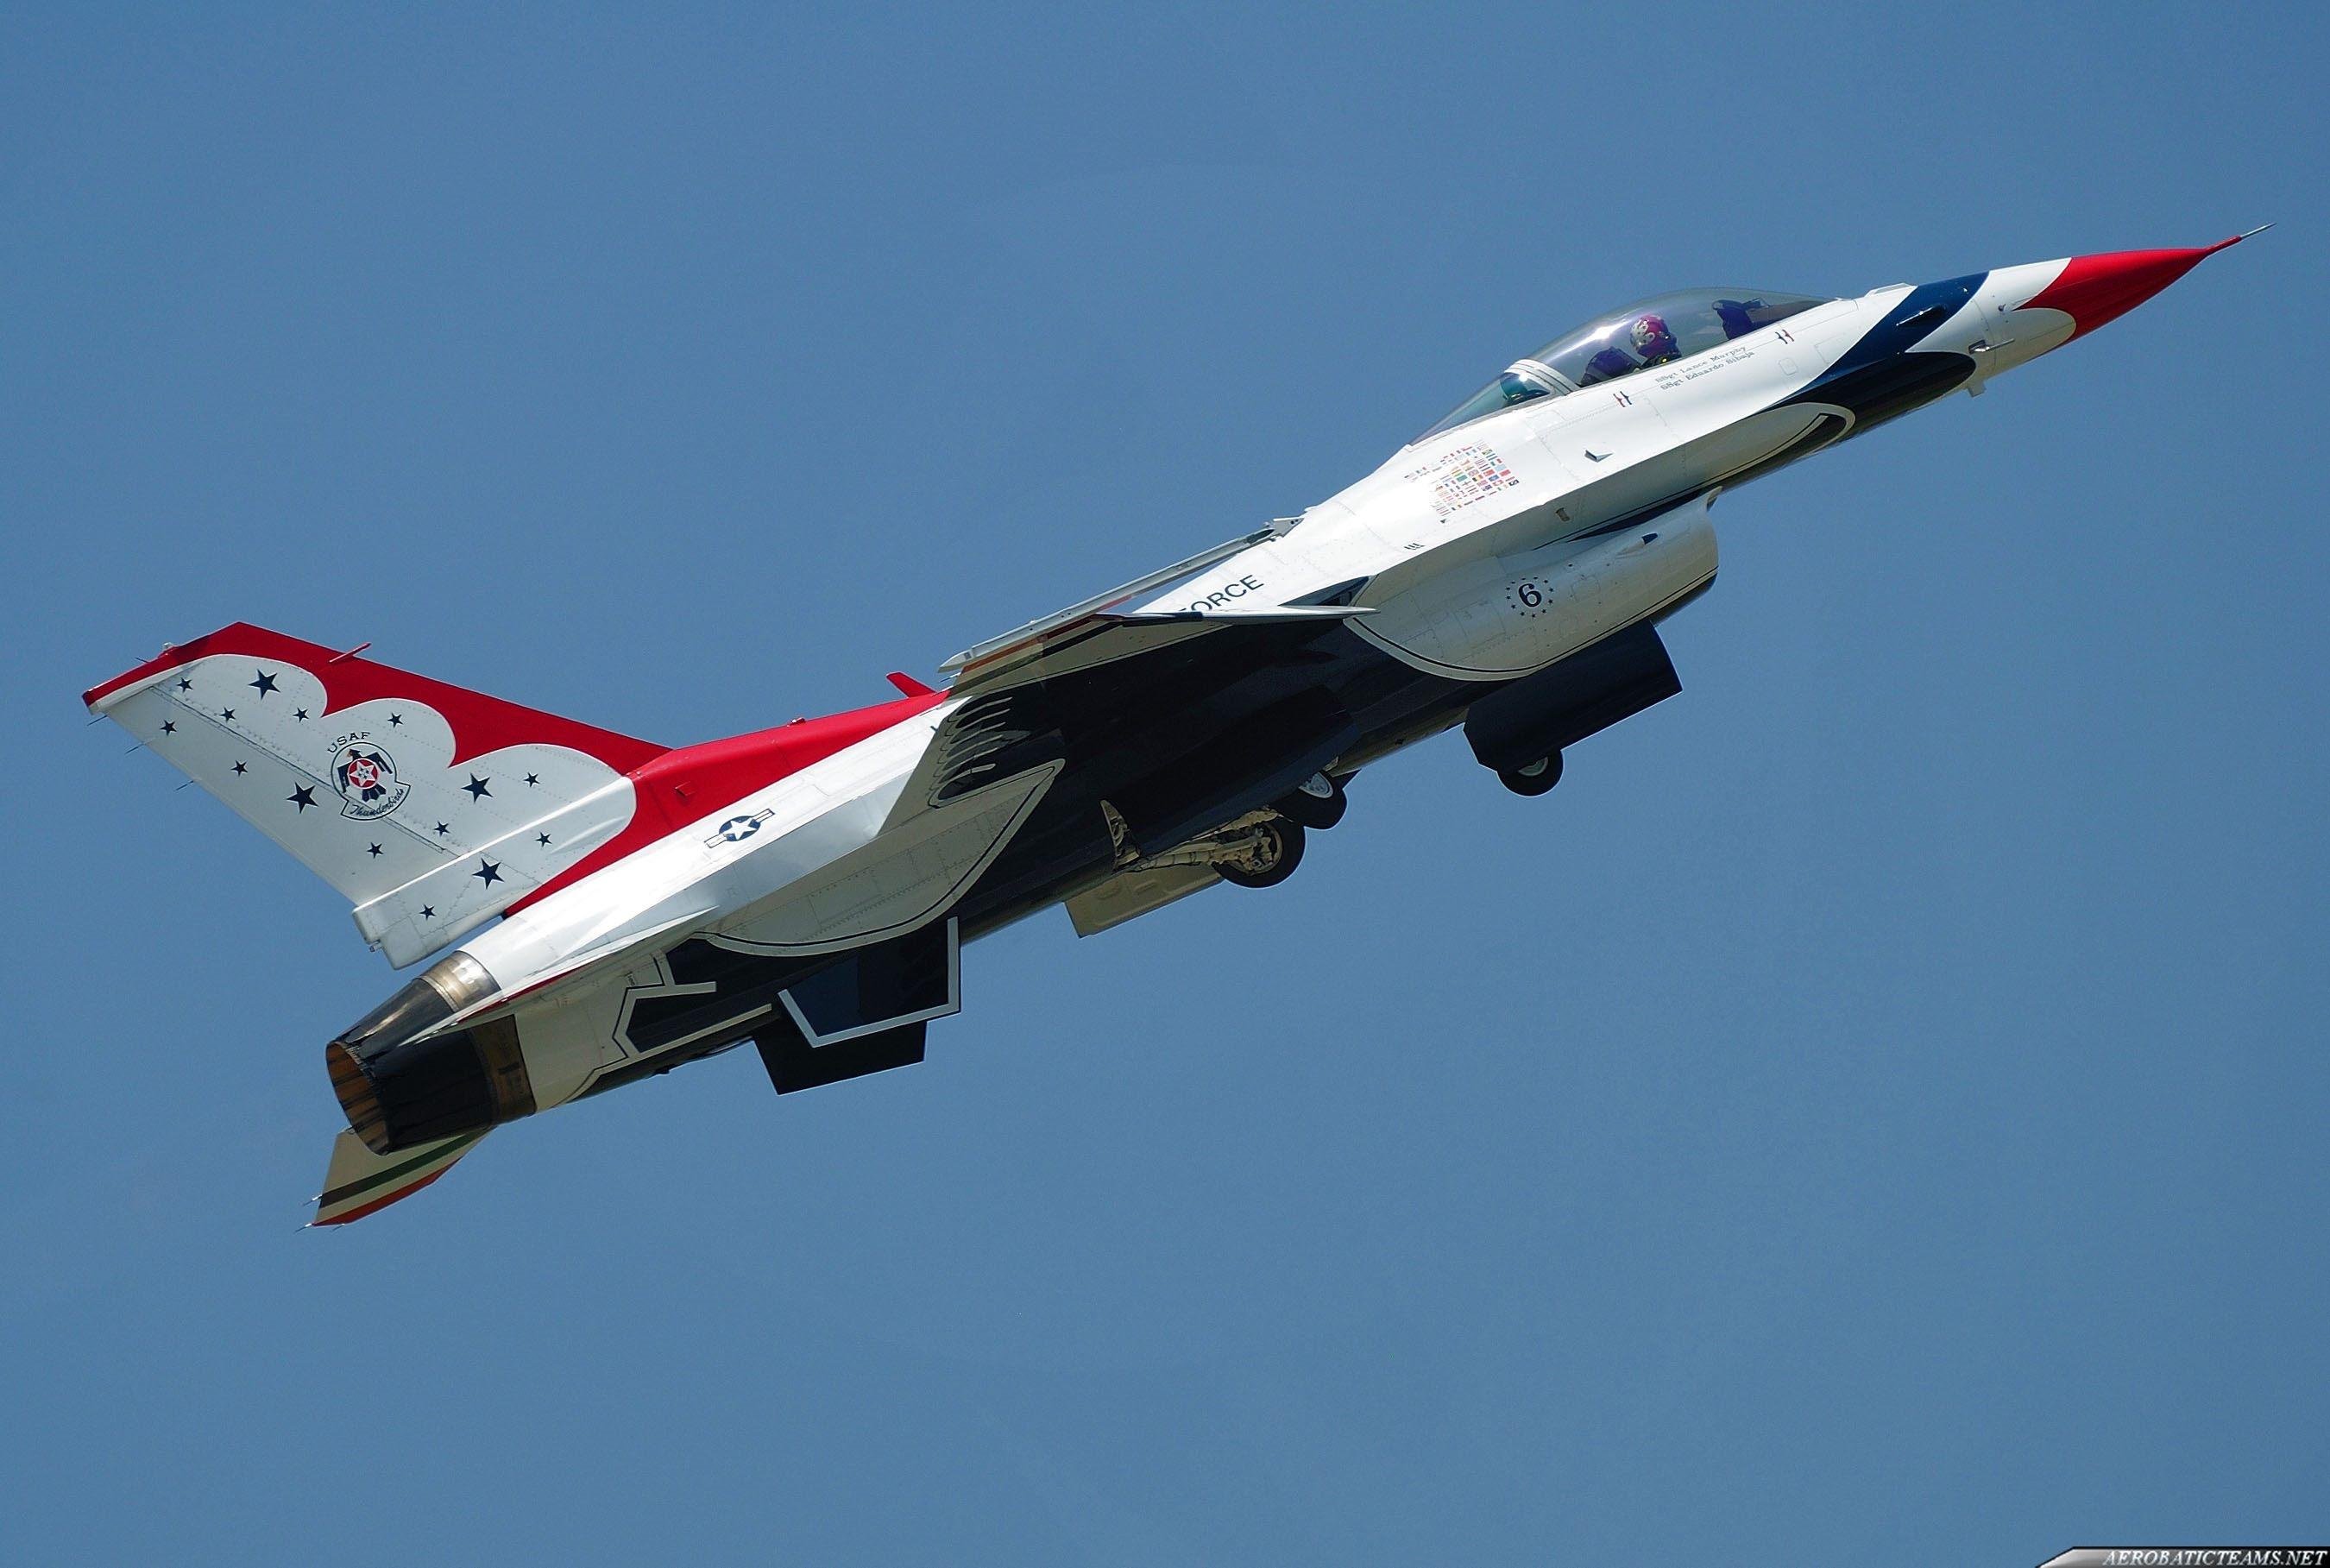 Thunderbirds F-16C #6 takes off